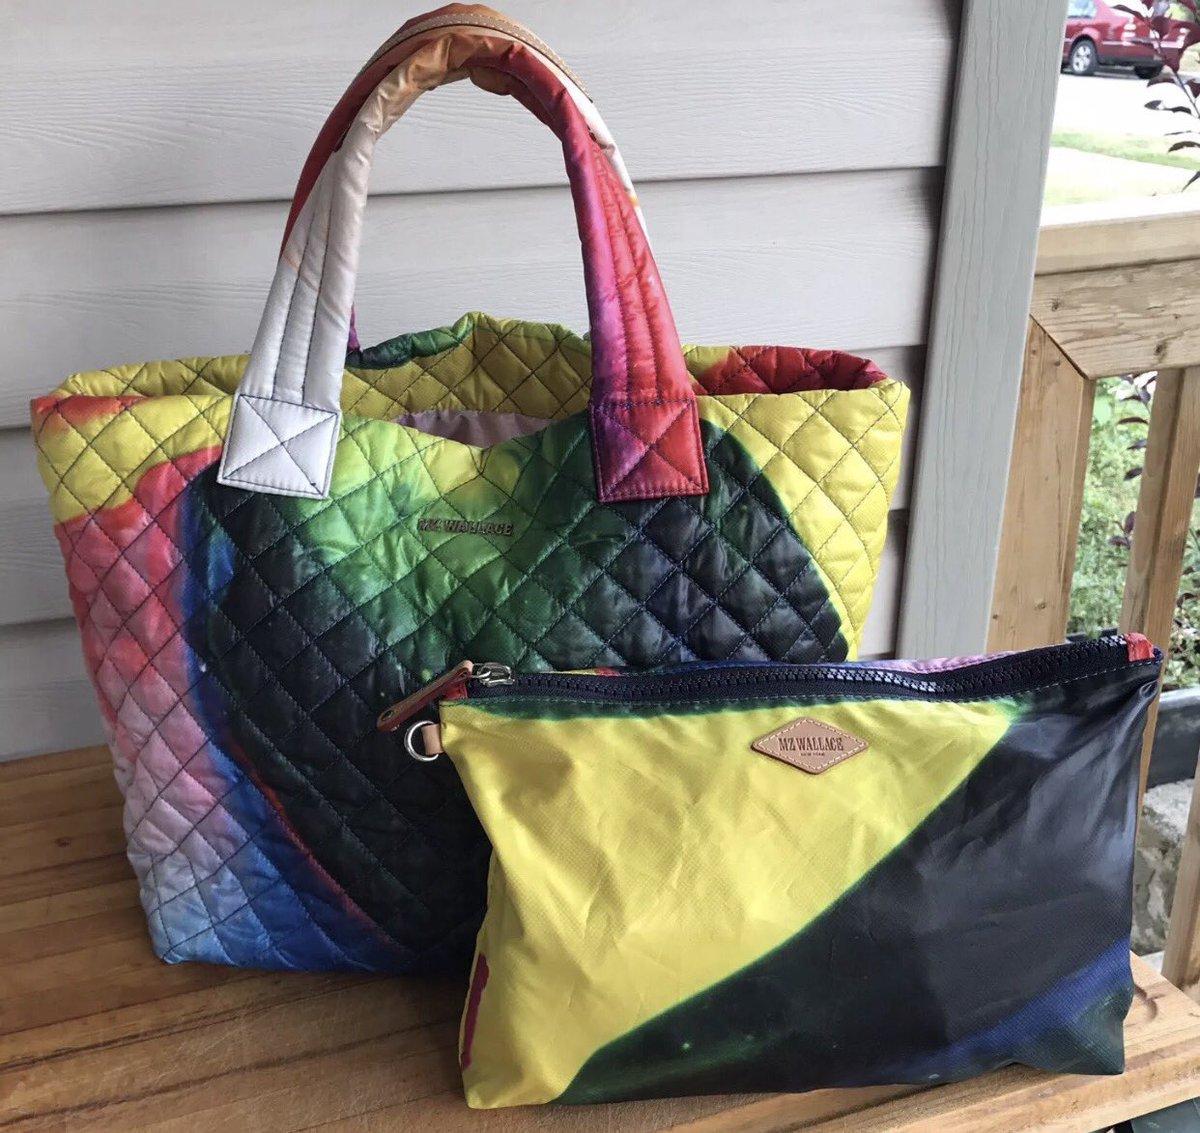 On Sale Now! MZ Wallace  https://www. ebay.ca/i/302482880684  &nbsp;   #mzwallace #ebay #sale #cosmic #tote #handbag #designer #fall #ladiesfashion #purse #chanel <br>http://pic.twitter.com/MhWN8EbYnJ